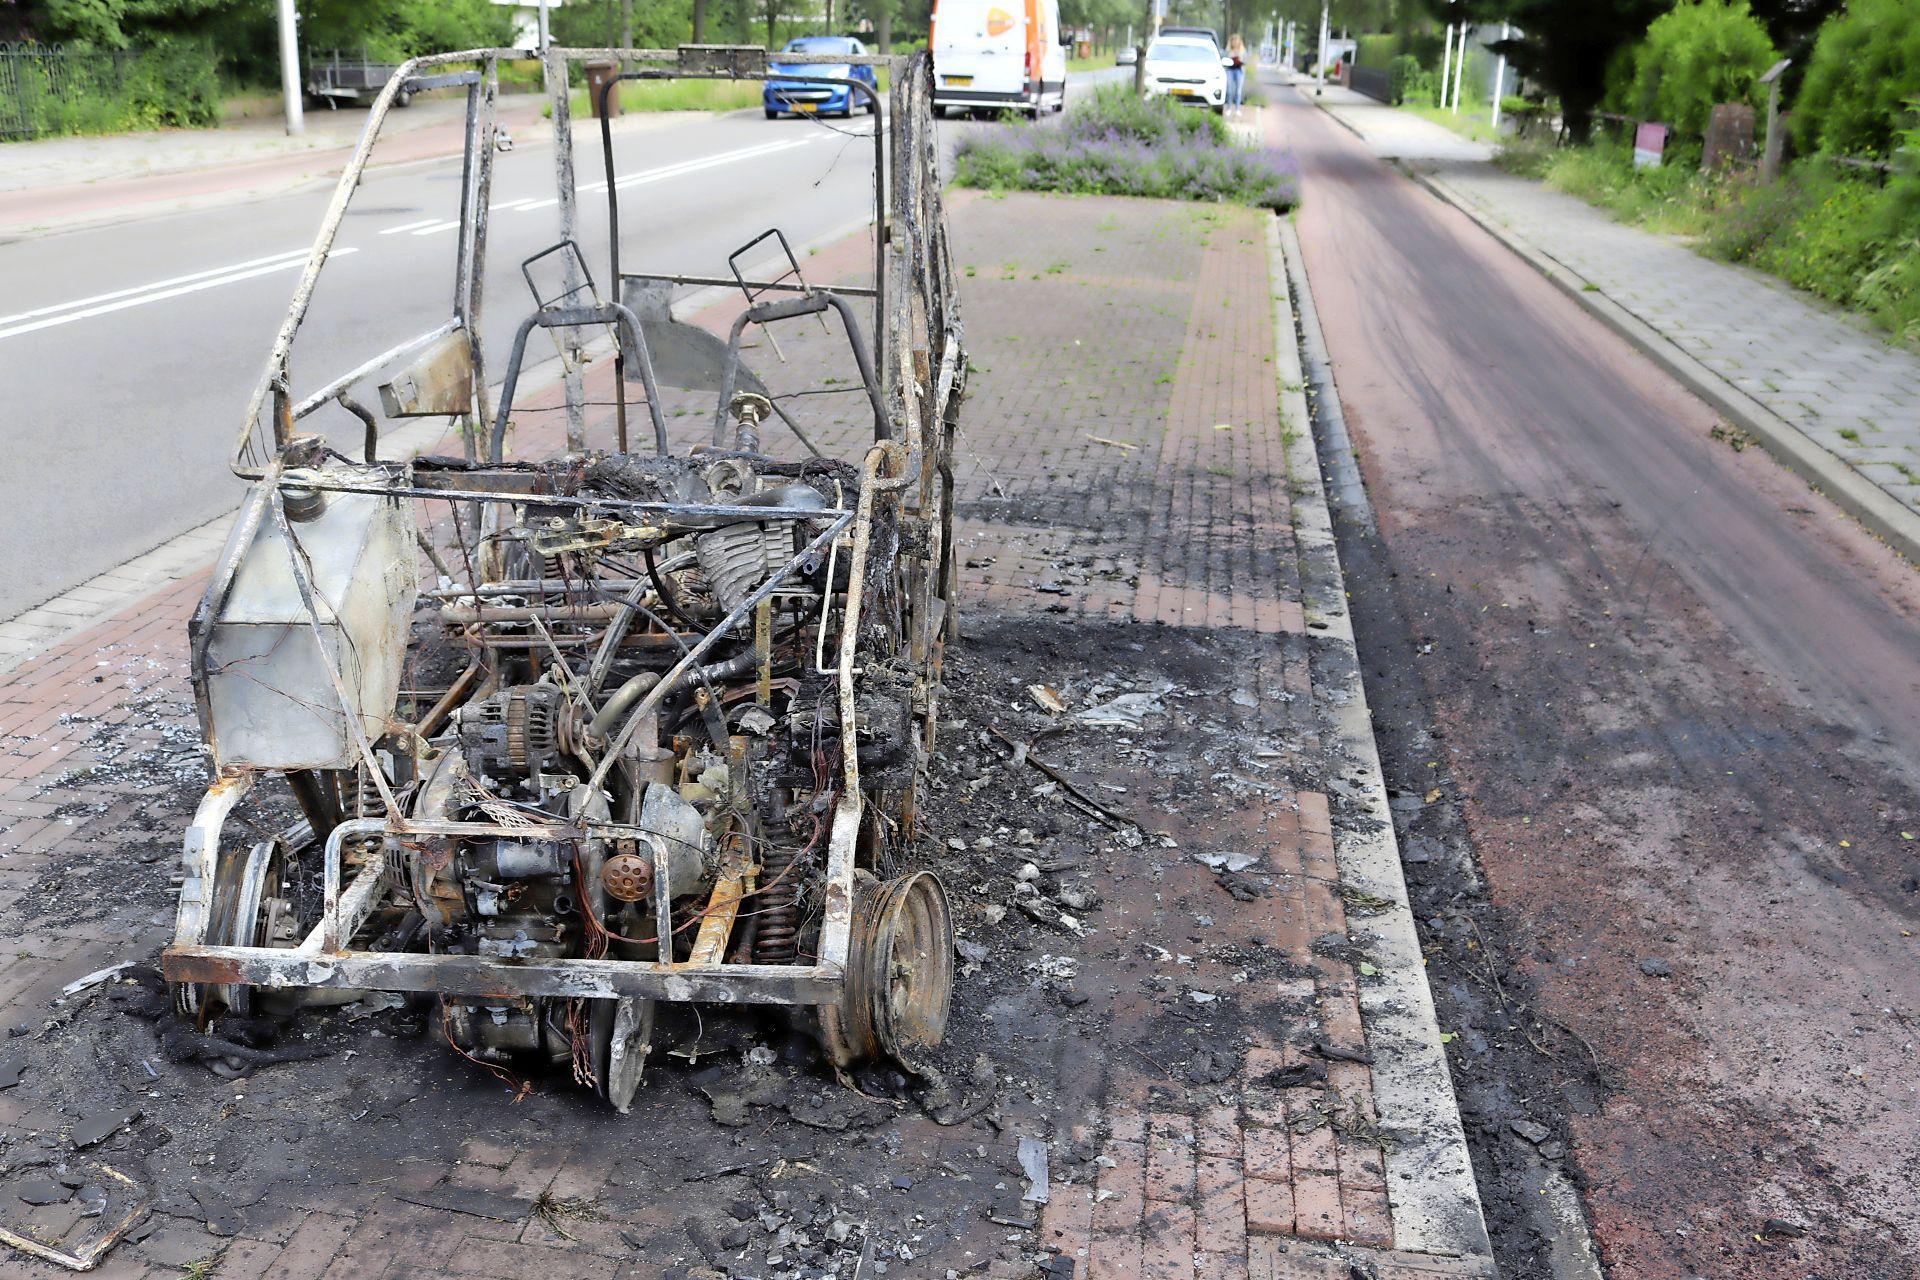 Brommobiel volledig uitgebrand in Hillegom, honderden meters fietspad vervuild